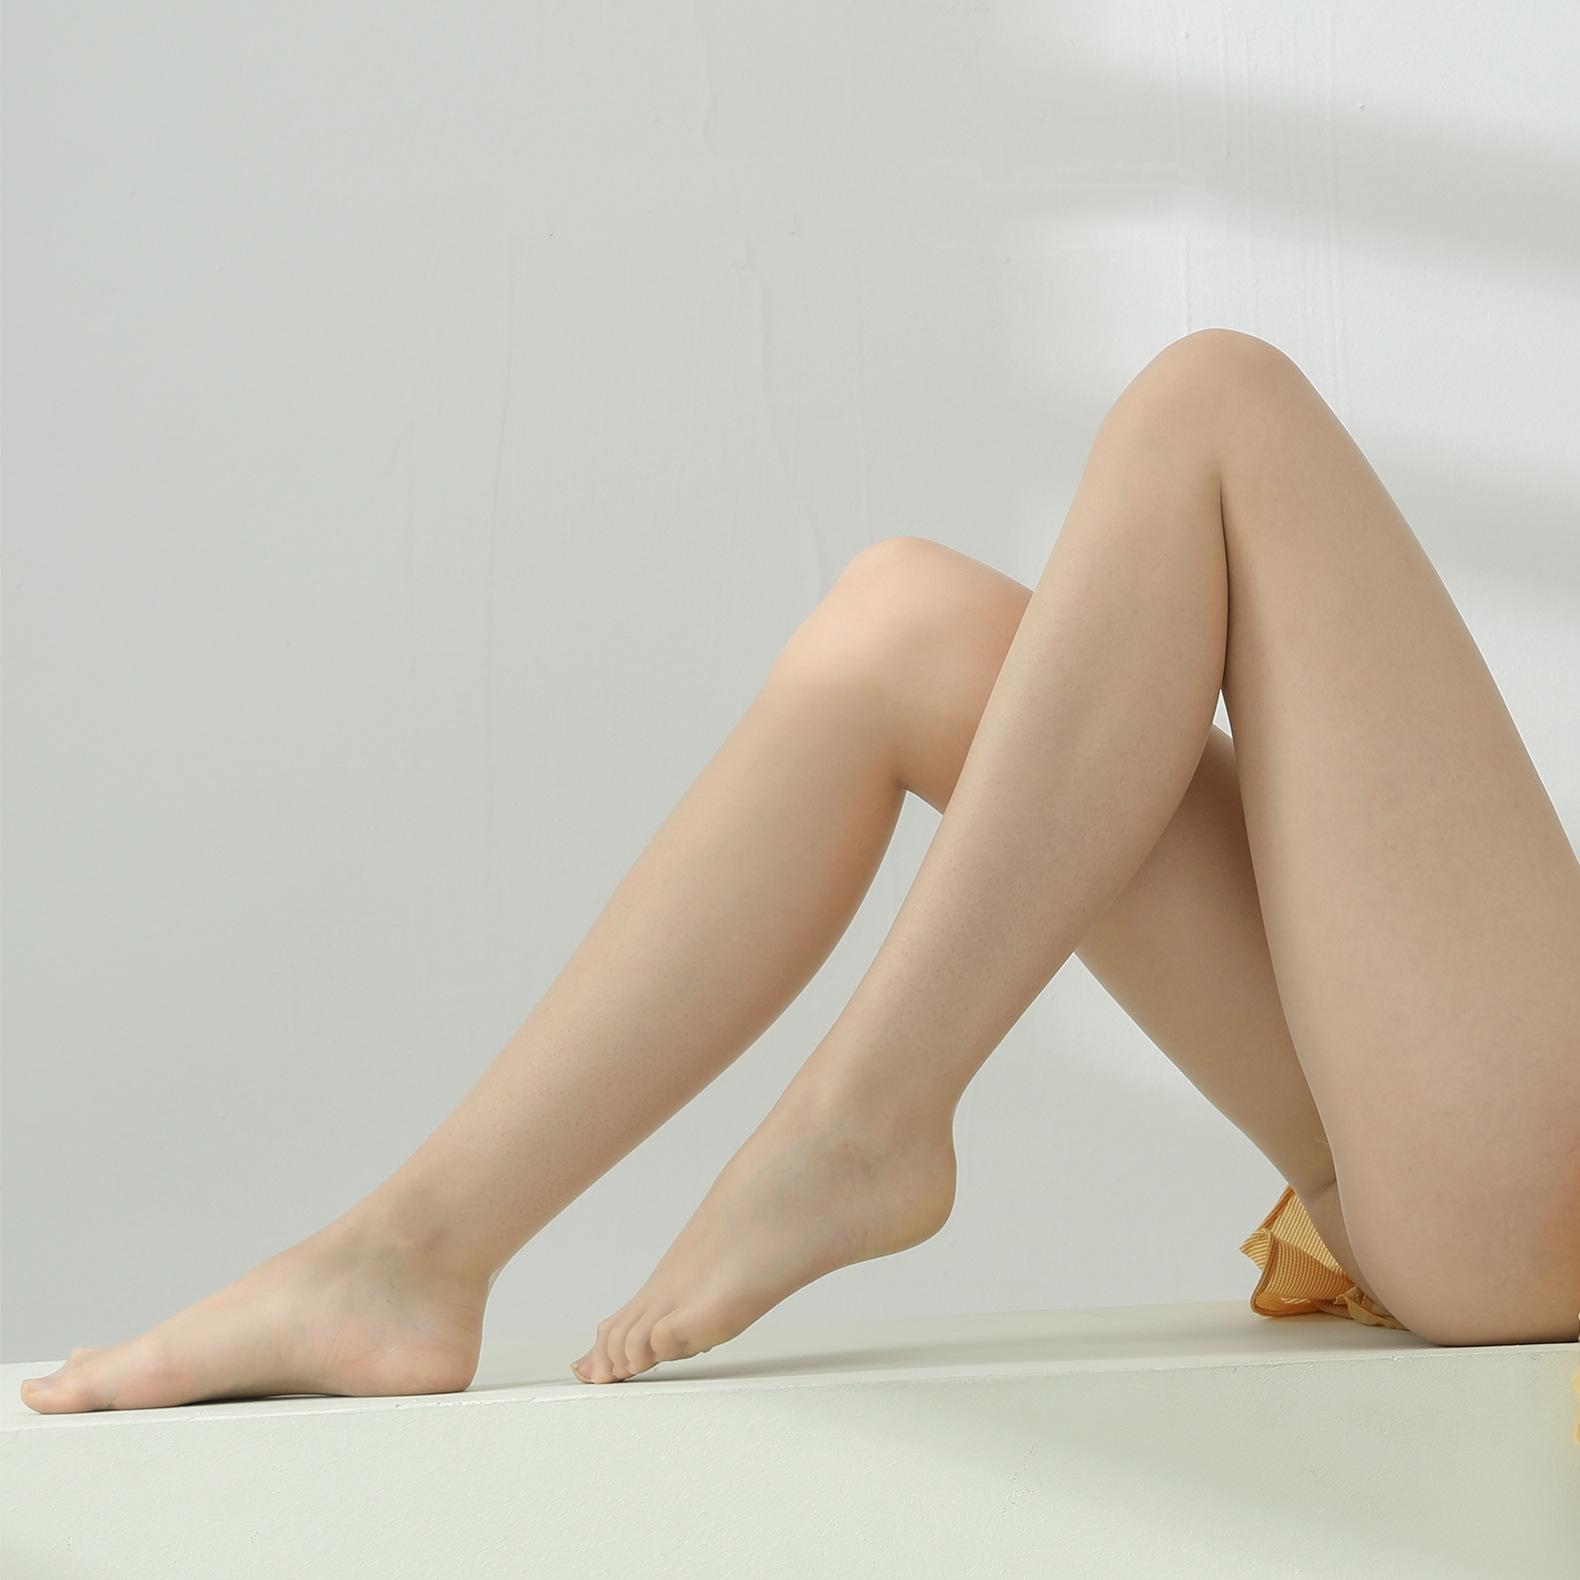 No Nonsense Women's Waist Sheer Toe Hosiery Seamless Pantyhose